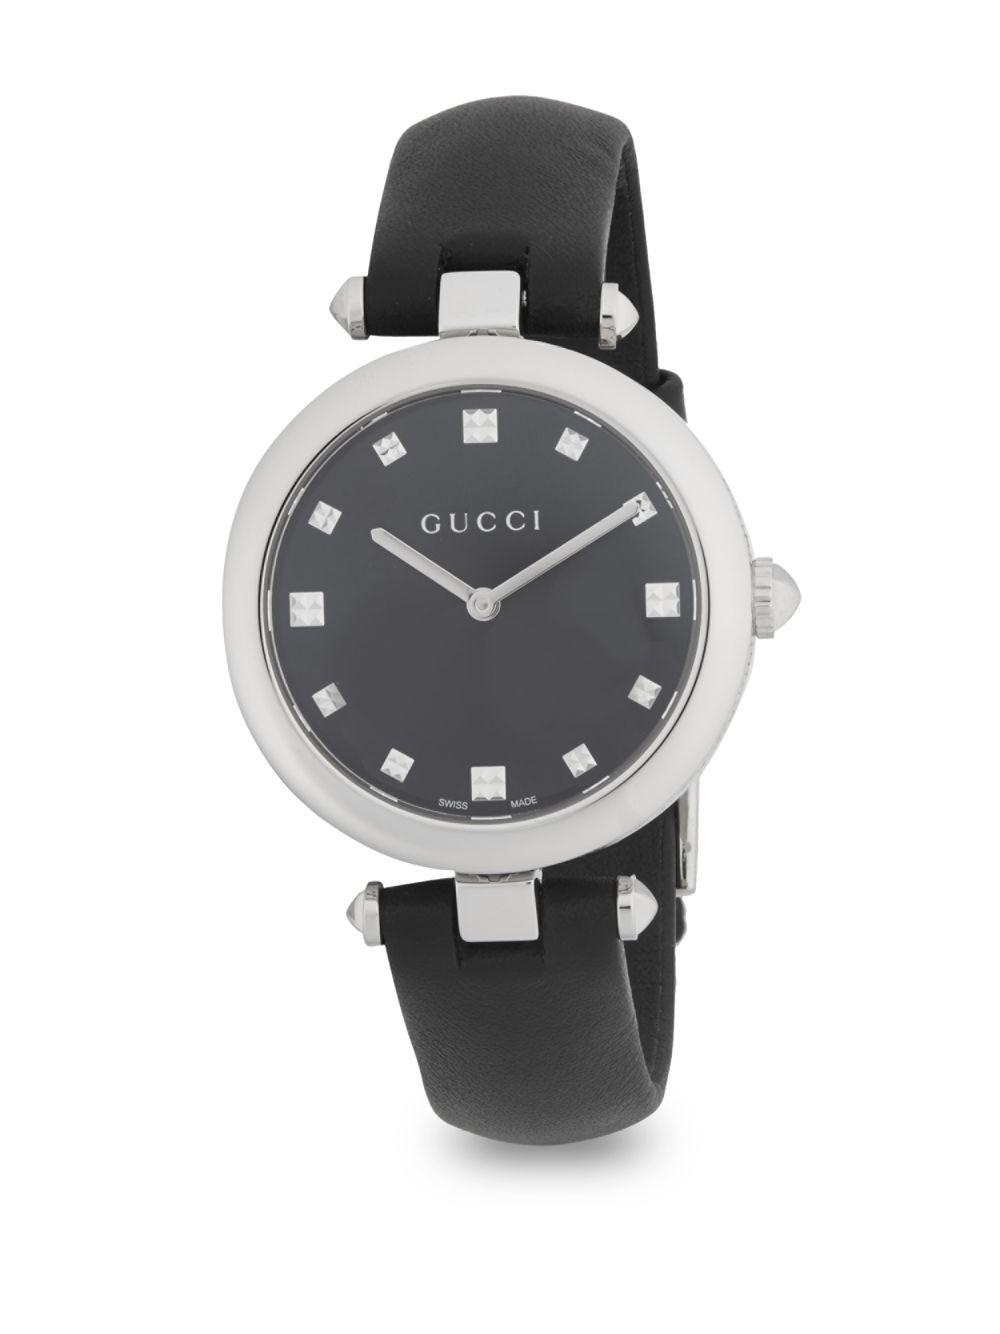 04a4fec1b43 Gucci - Black Diamantissima Leather Strap Watch - Lyst. View fullscreen